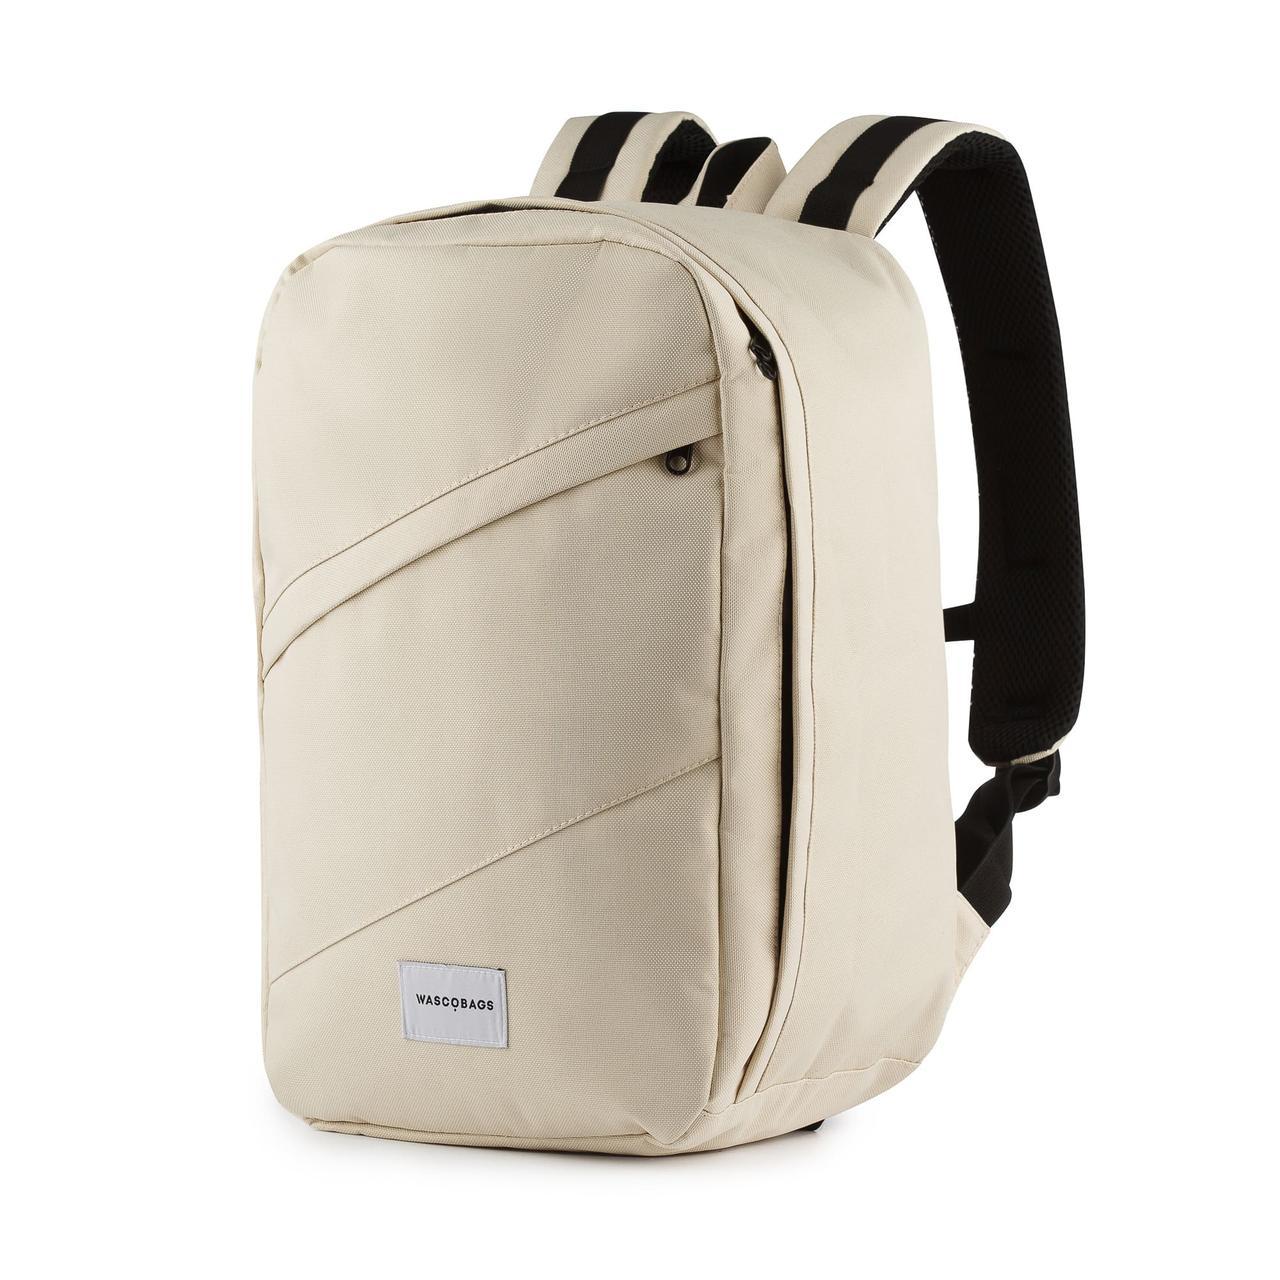 Рюкзак для ручной клади Wascobags 40x20x25 RW Бежевый